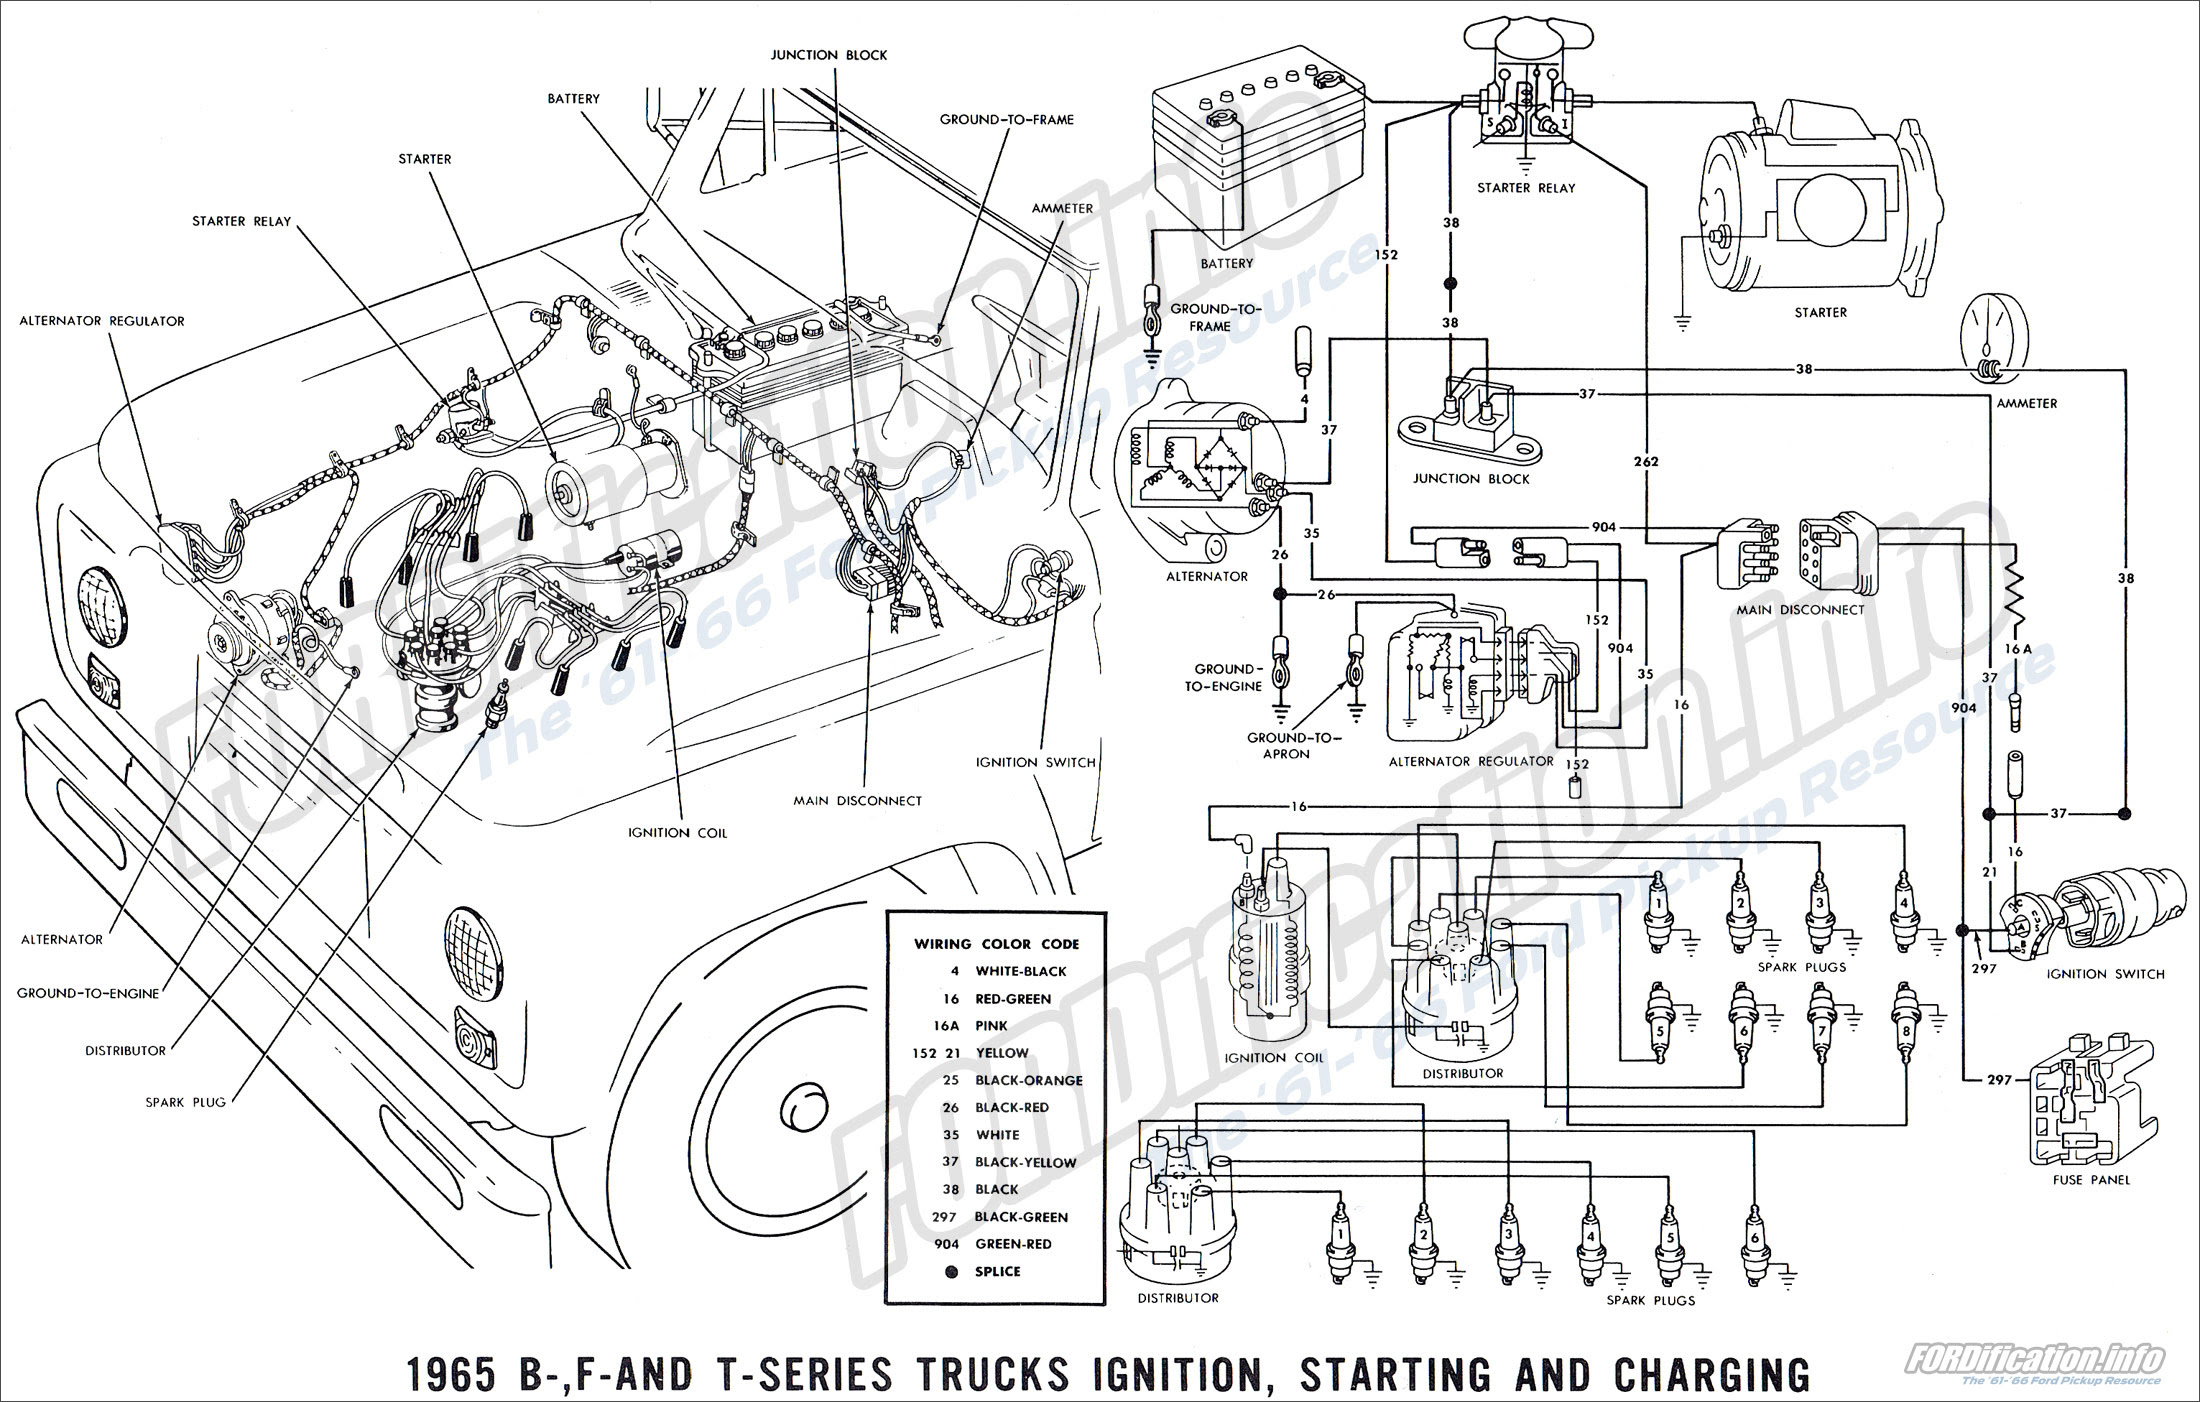 1959 ford f100 wiring diagram 28 1965 ford f100 wiring diagram wiring diagram list  28 1965 ford f100 wiring diagram